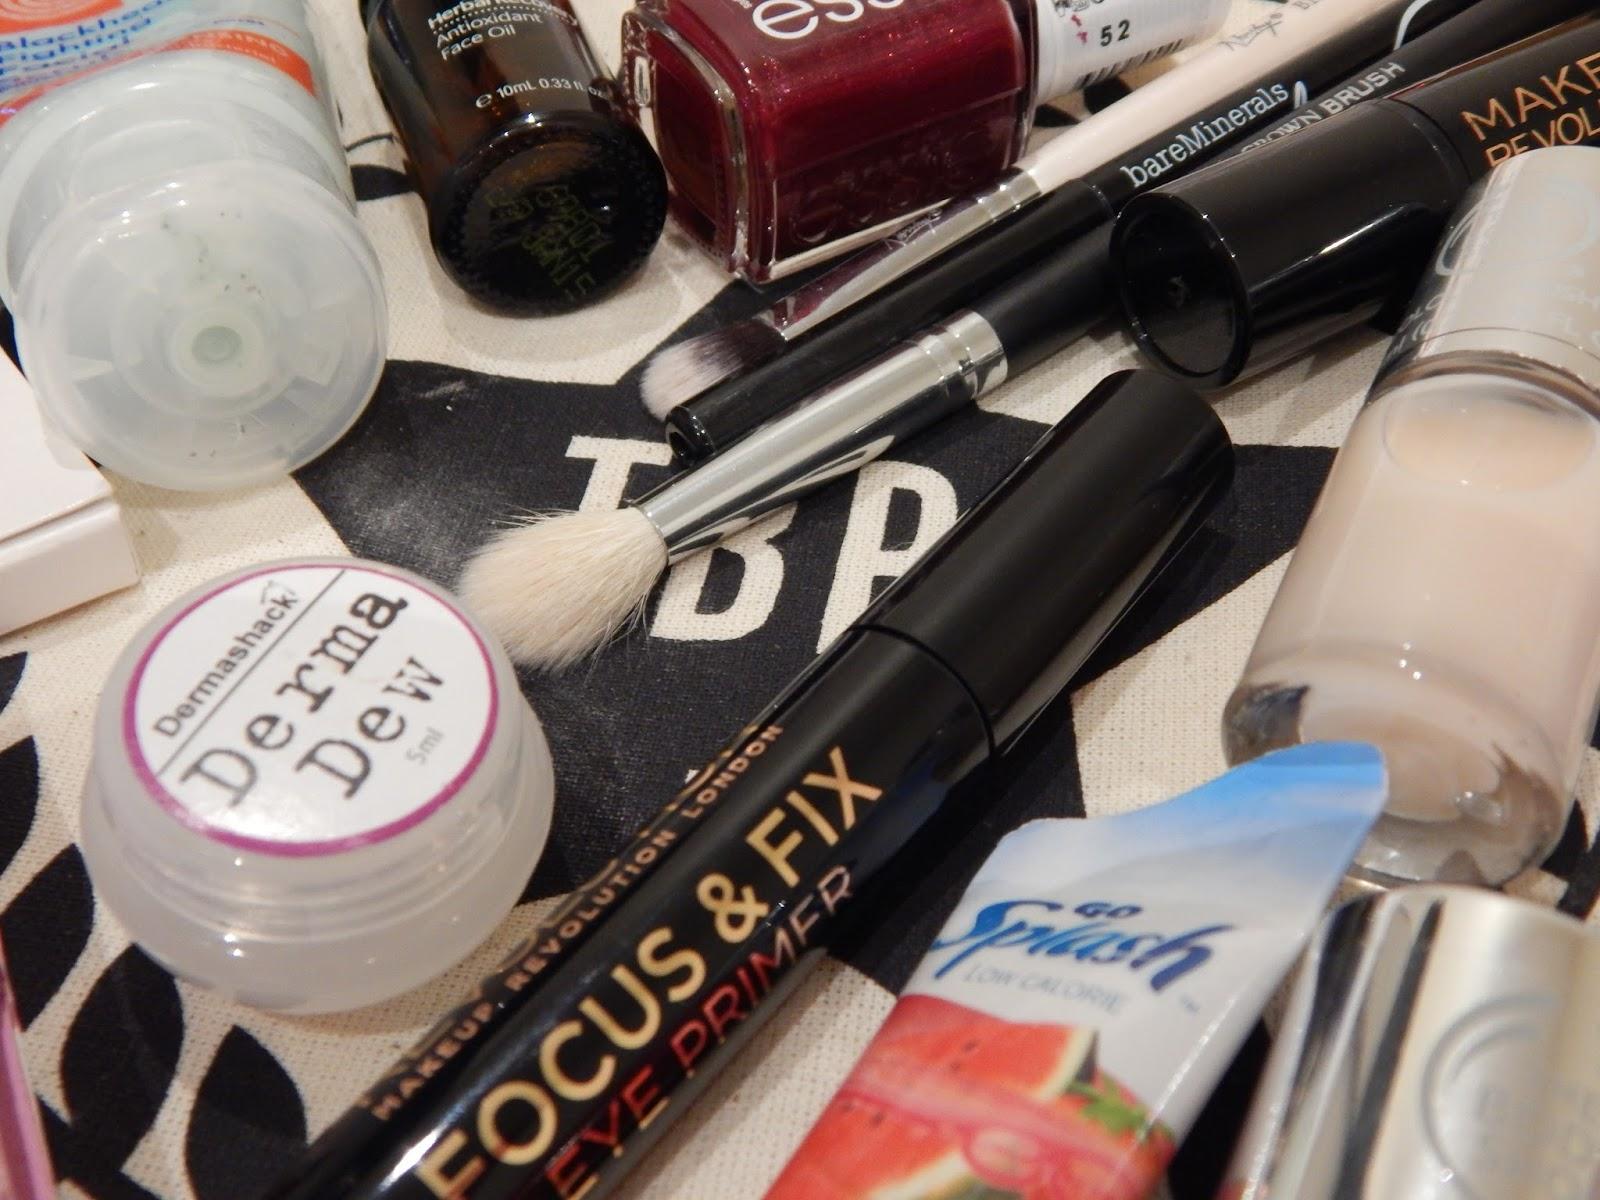 #Sheffieldbbloggers goodie bag, sheffield bloggers